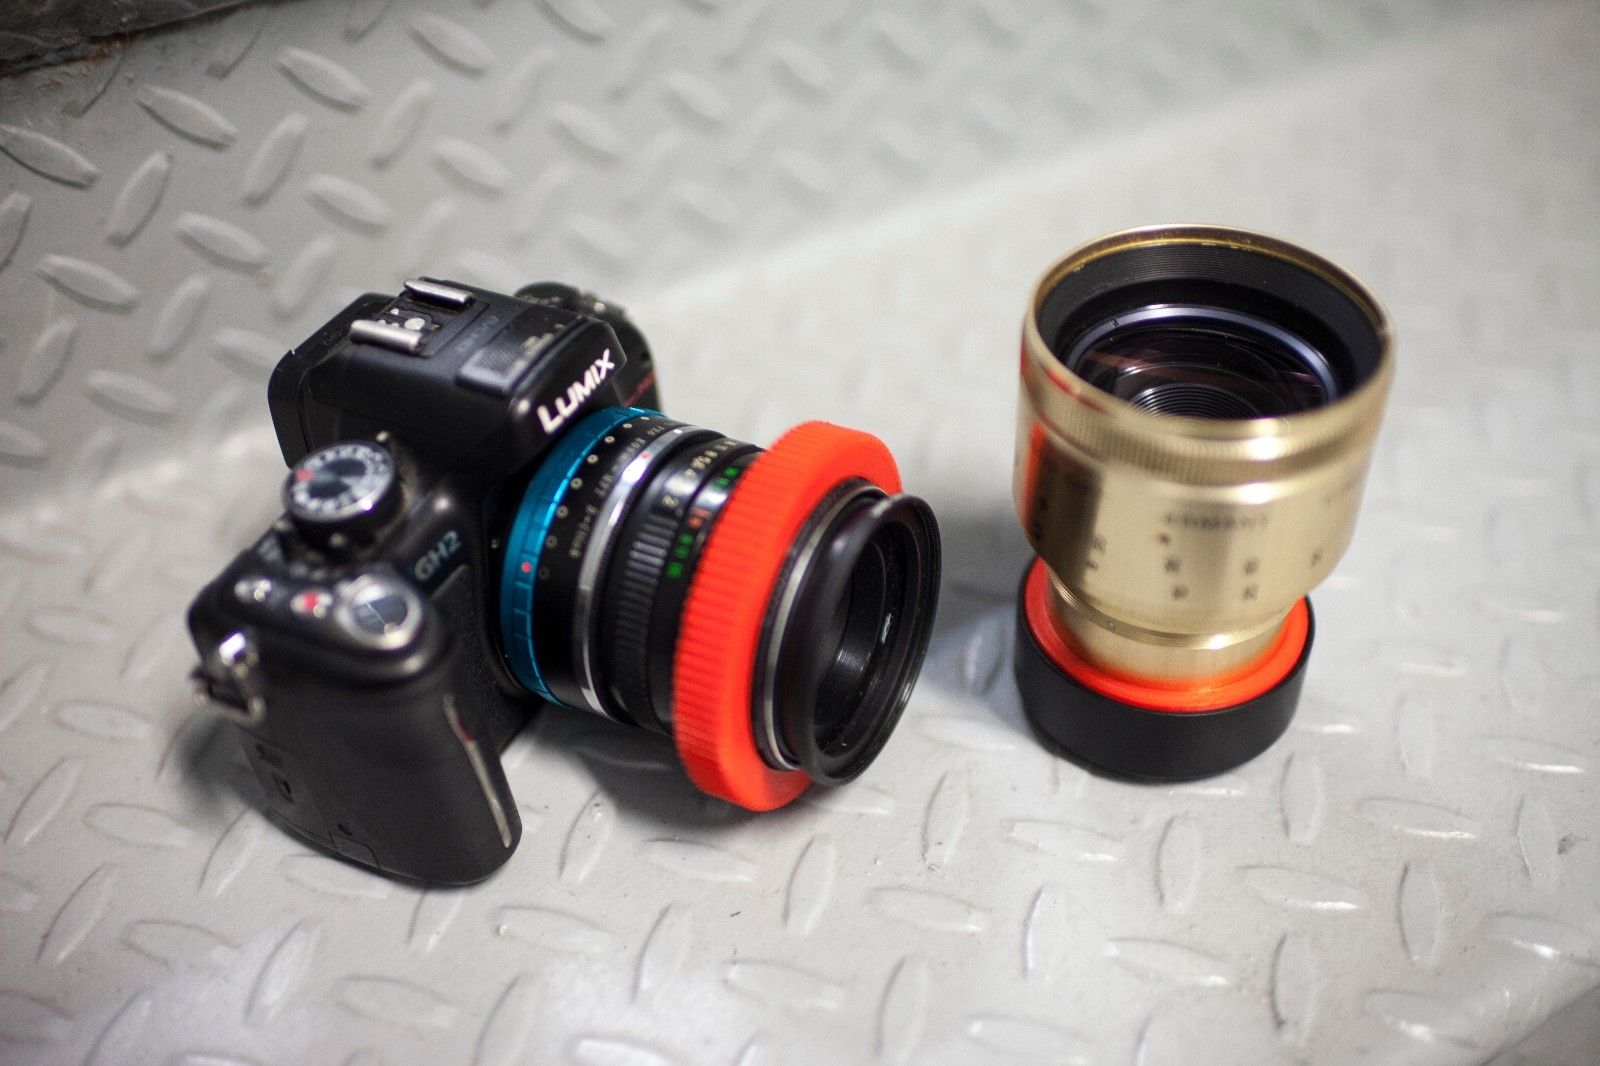 Anamorphic Lens Clamp